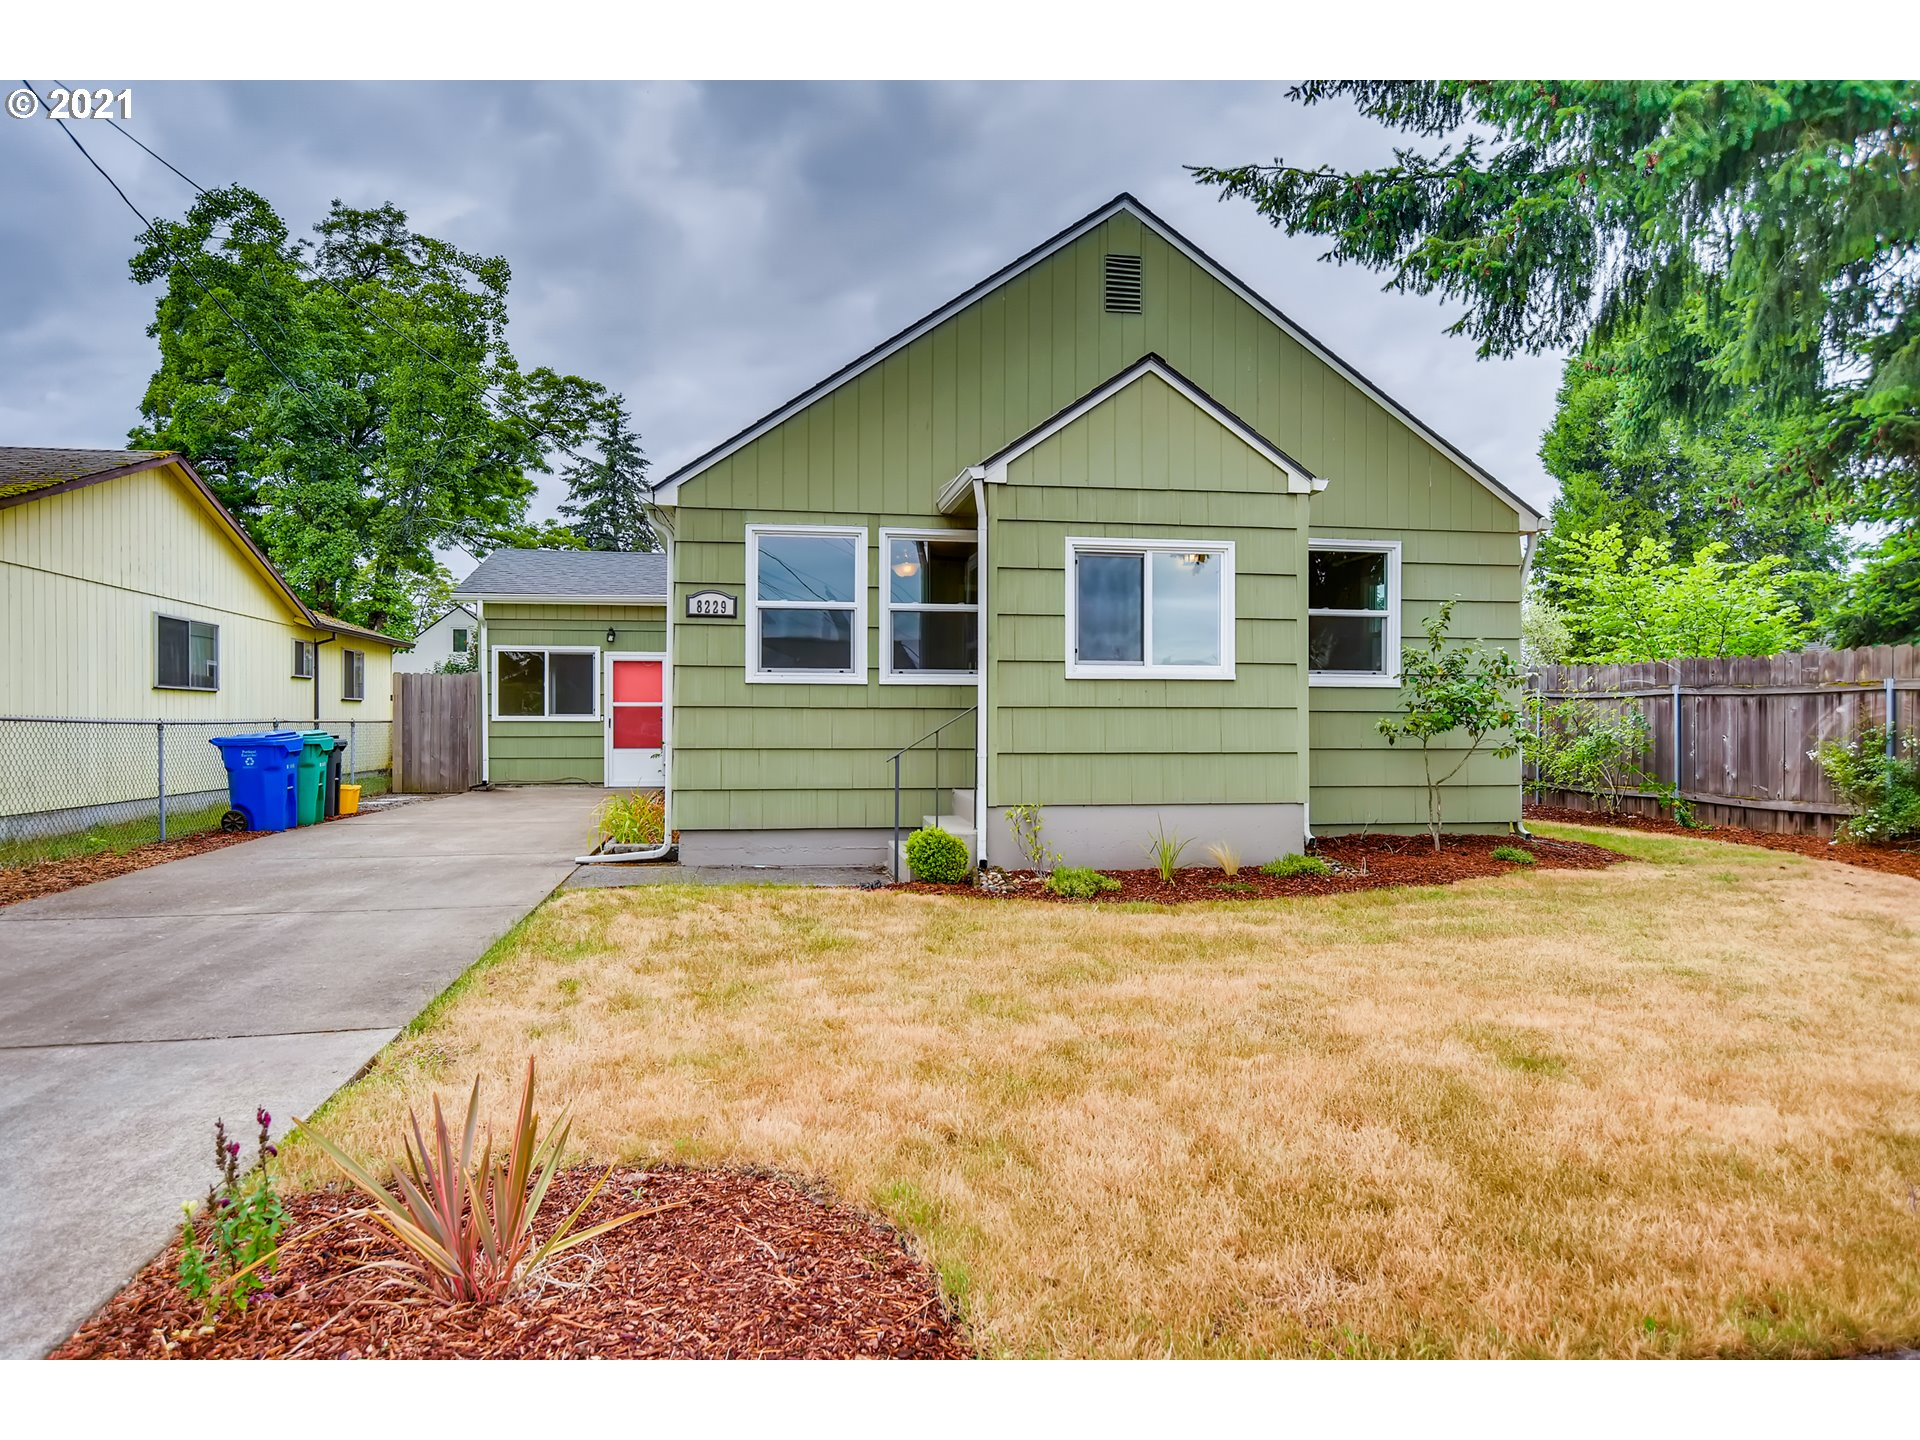 8229 SE 70TH AVE, Portland OR 97206